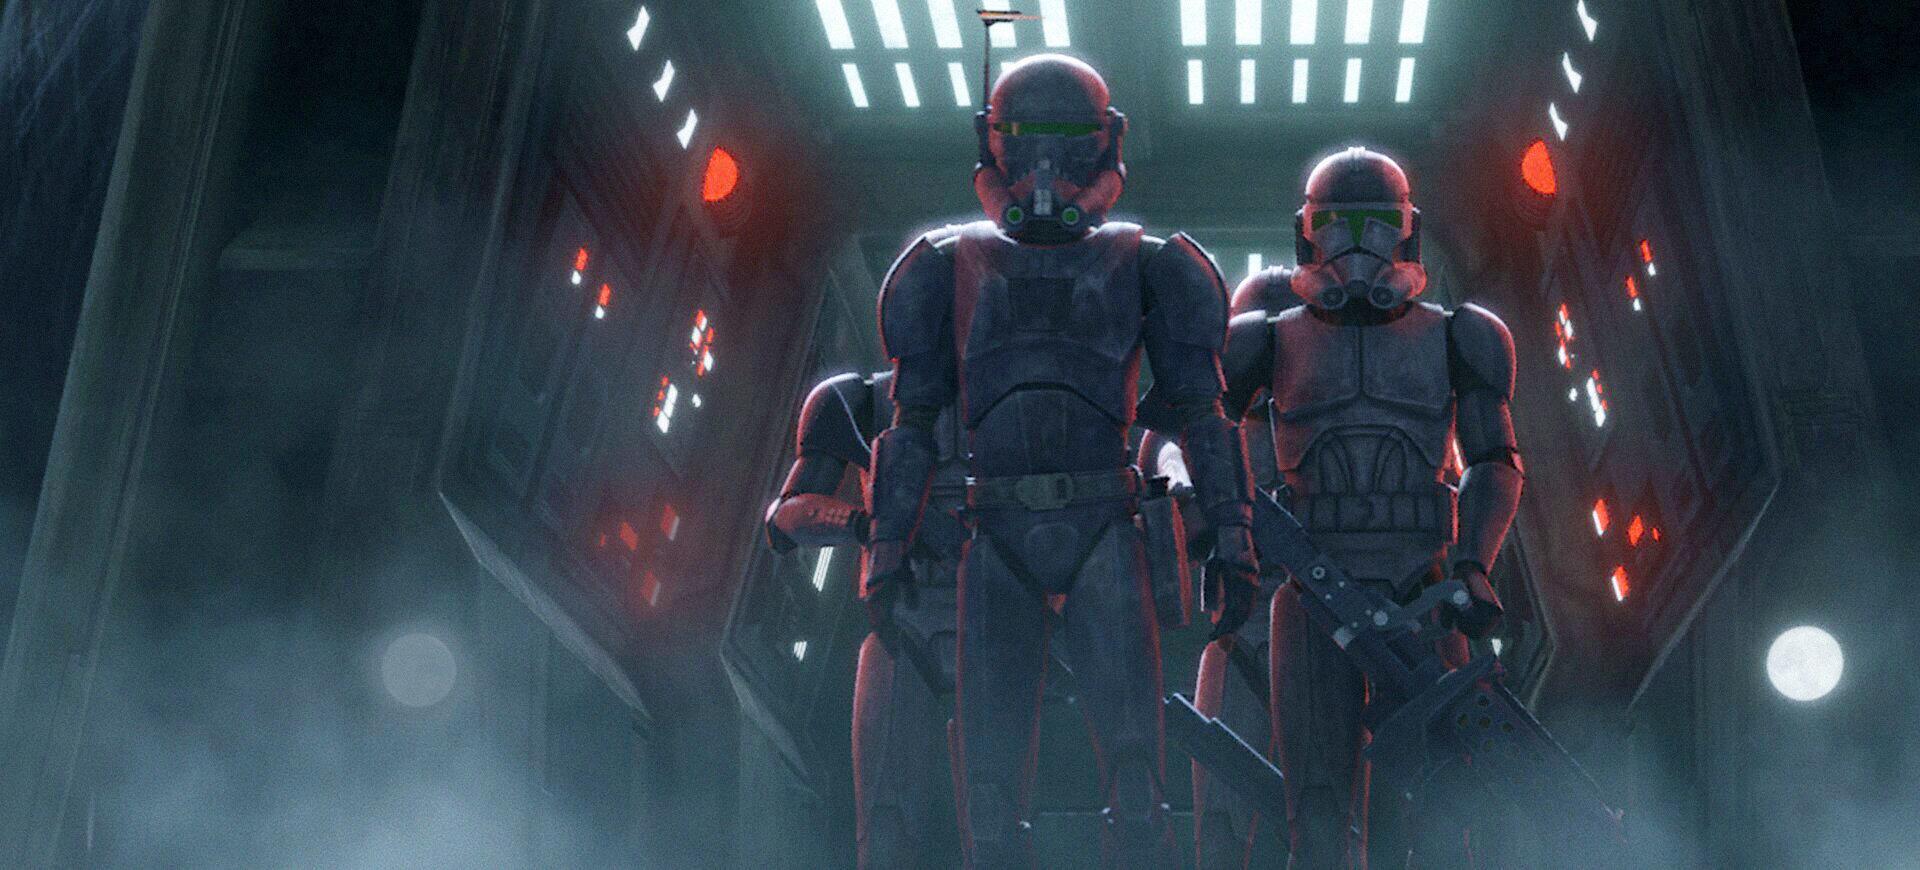 Звёздные войны: Бракованная партия — s01e03 — Replacements